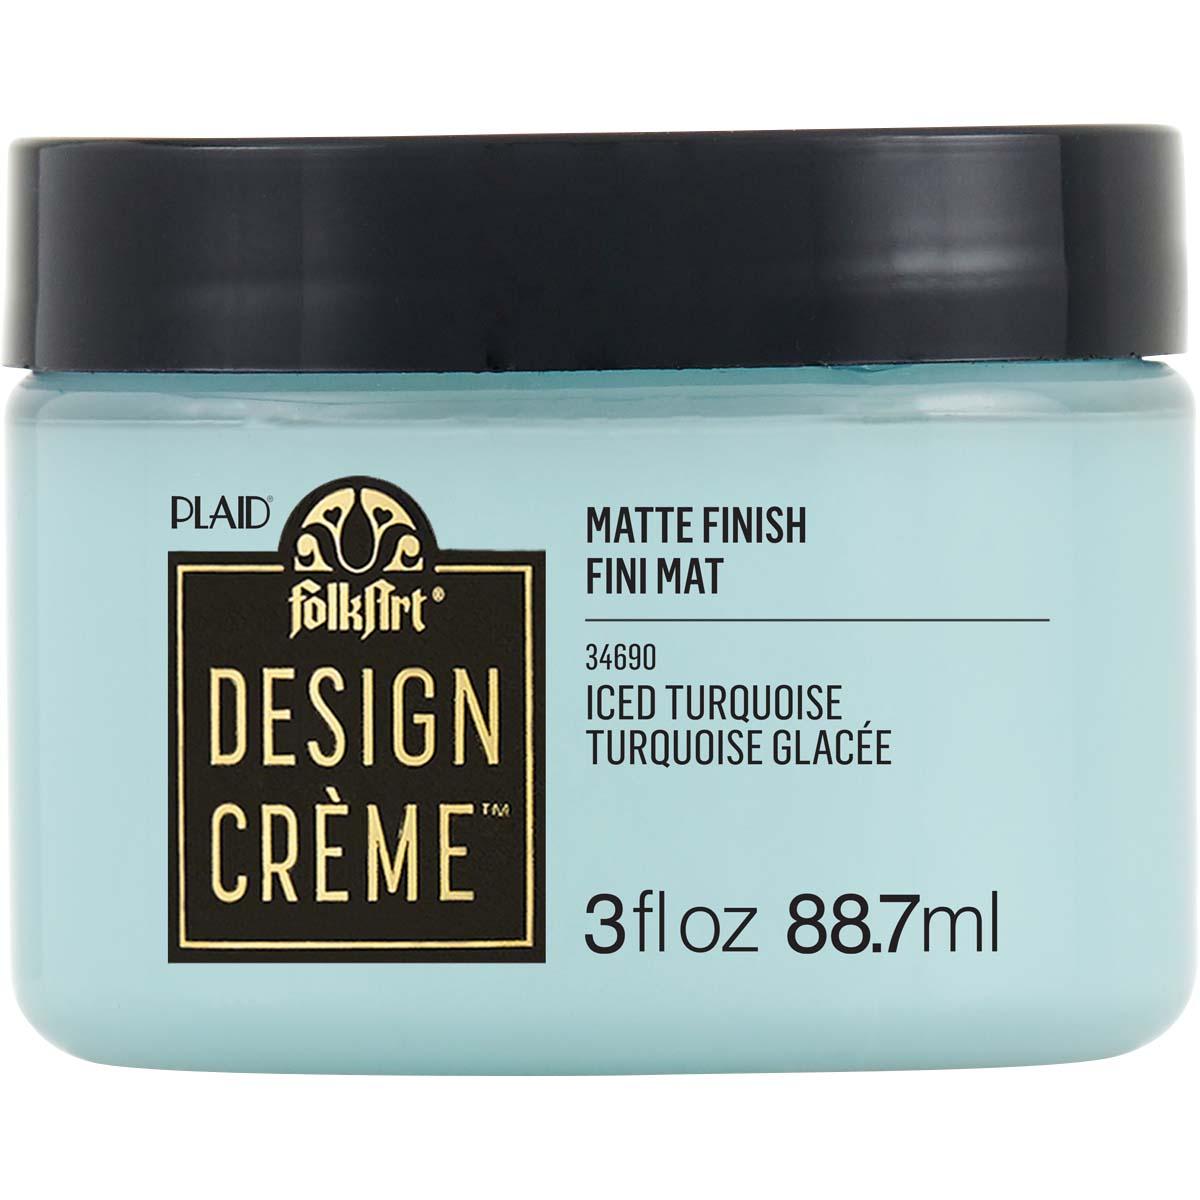 FolkArt ® Design Creme™ - Iced Turquoise, 3 oz. - 34690